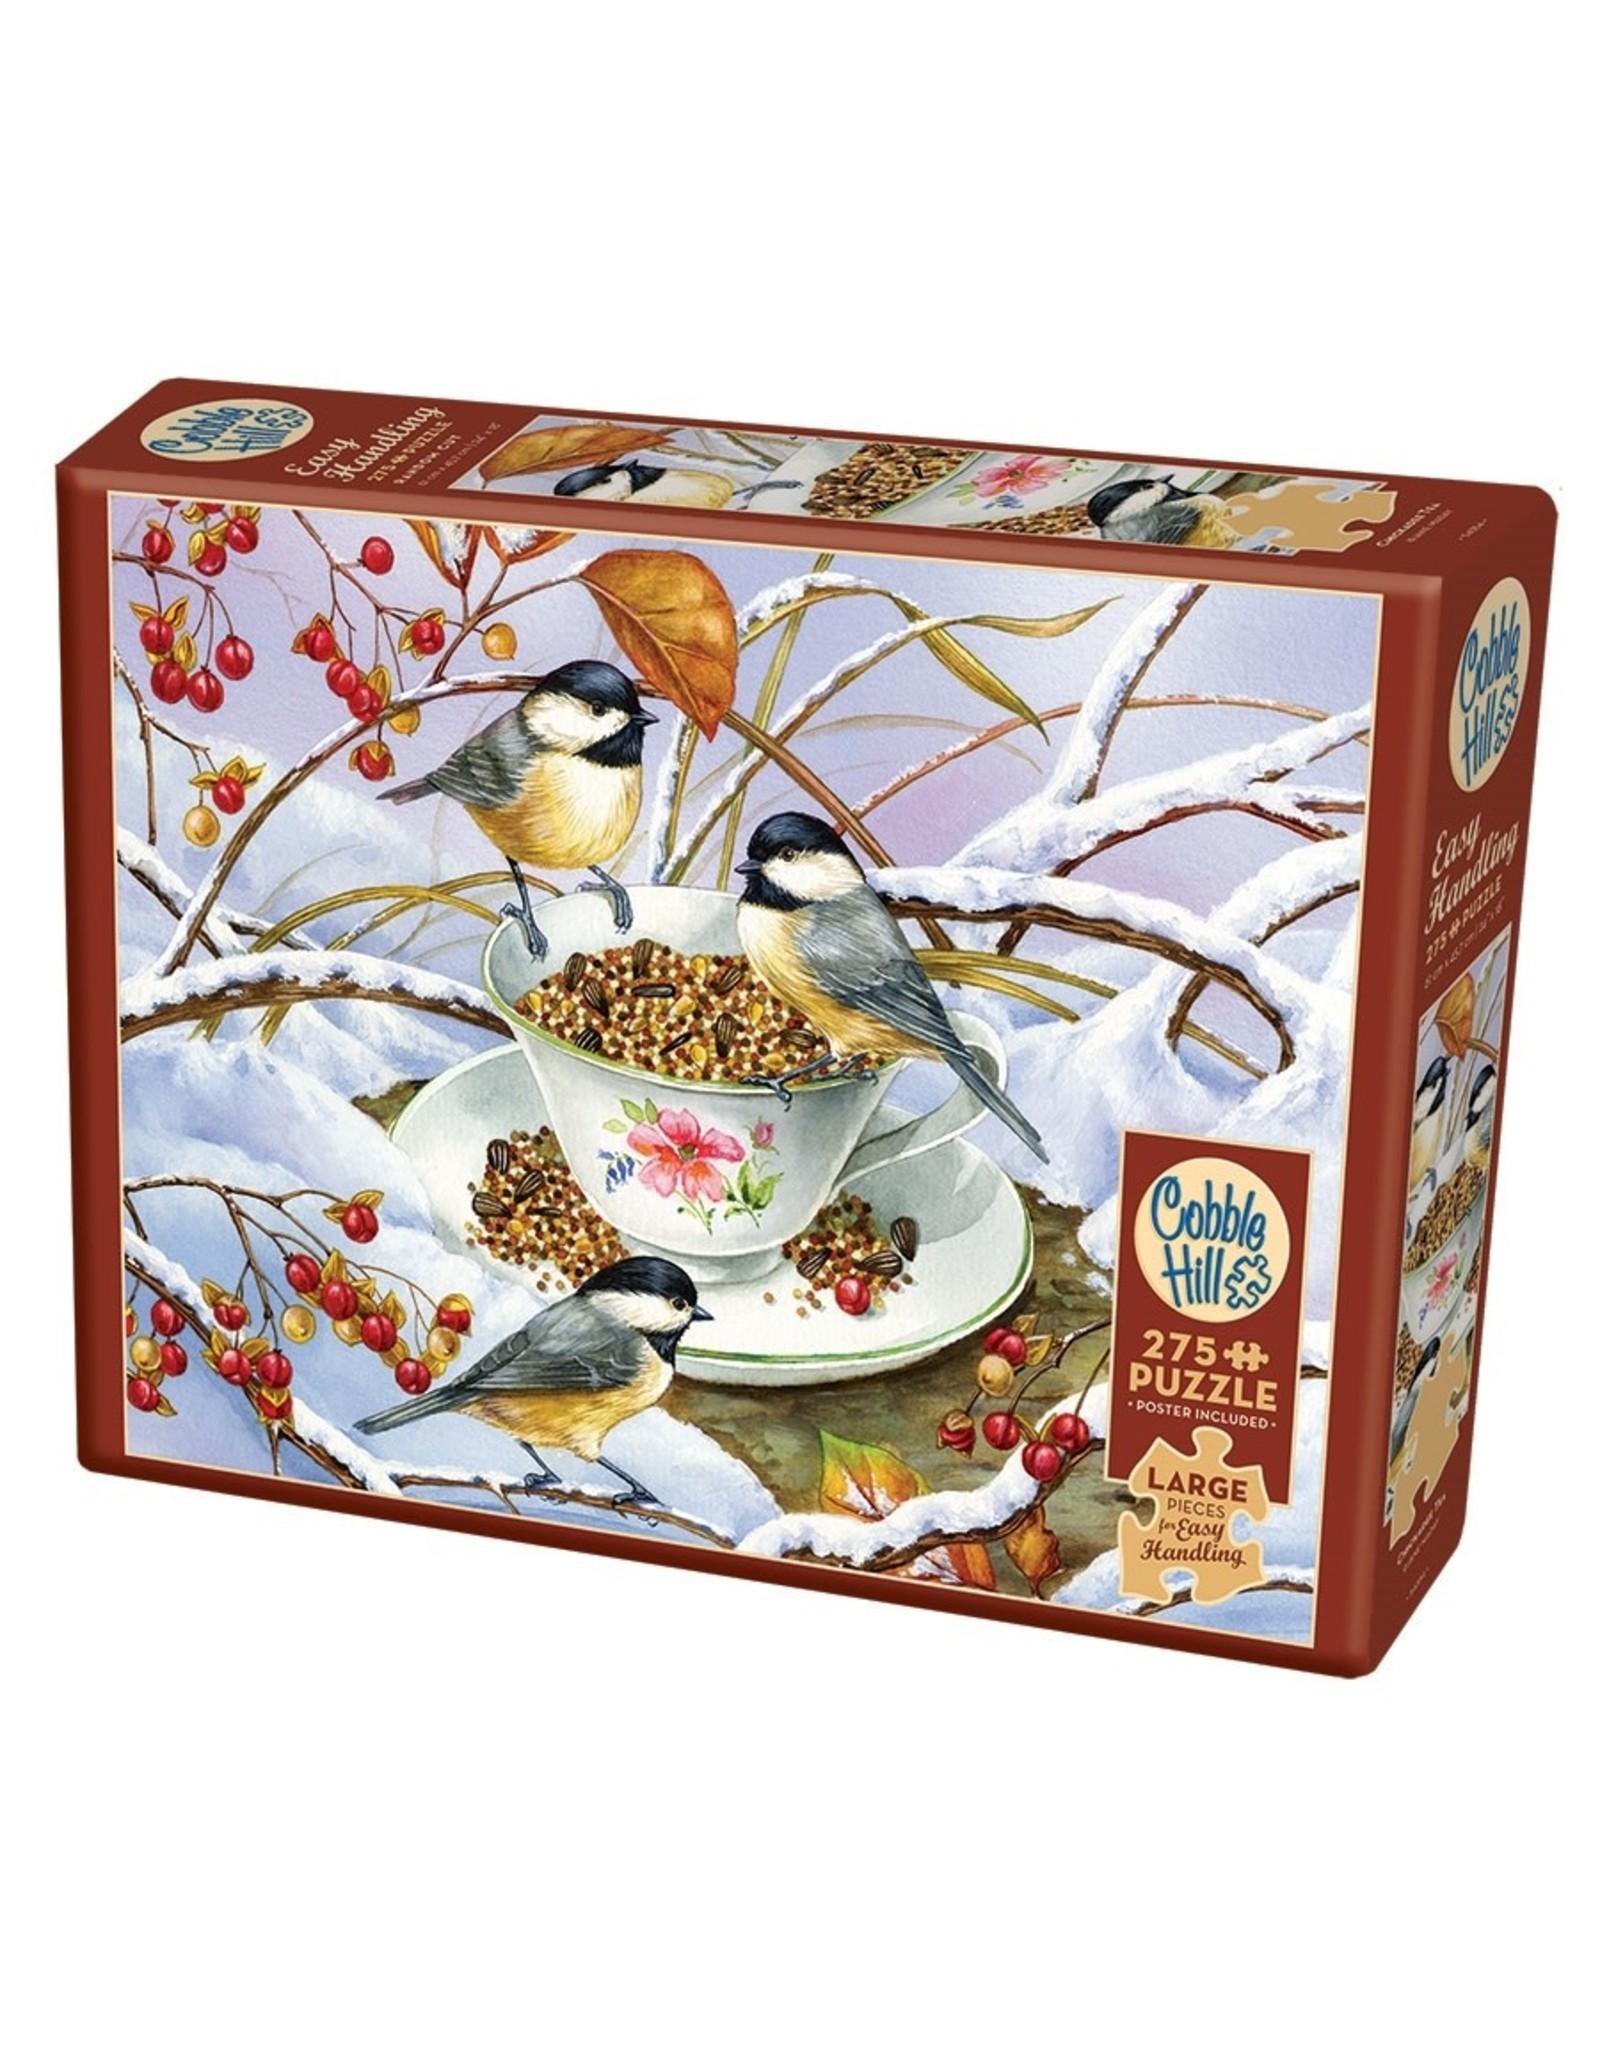 Cobble Hill Chickadee Tea 275 pc